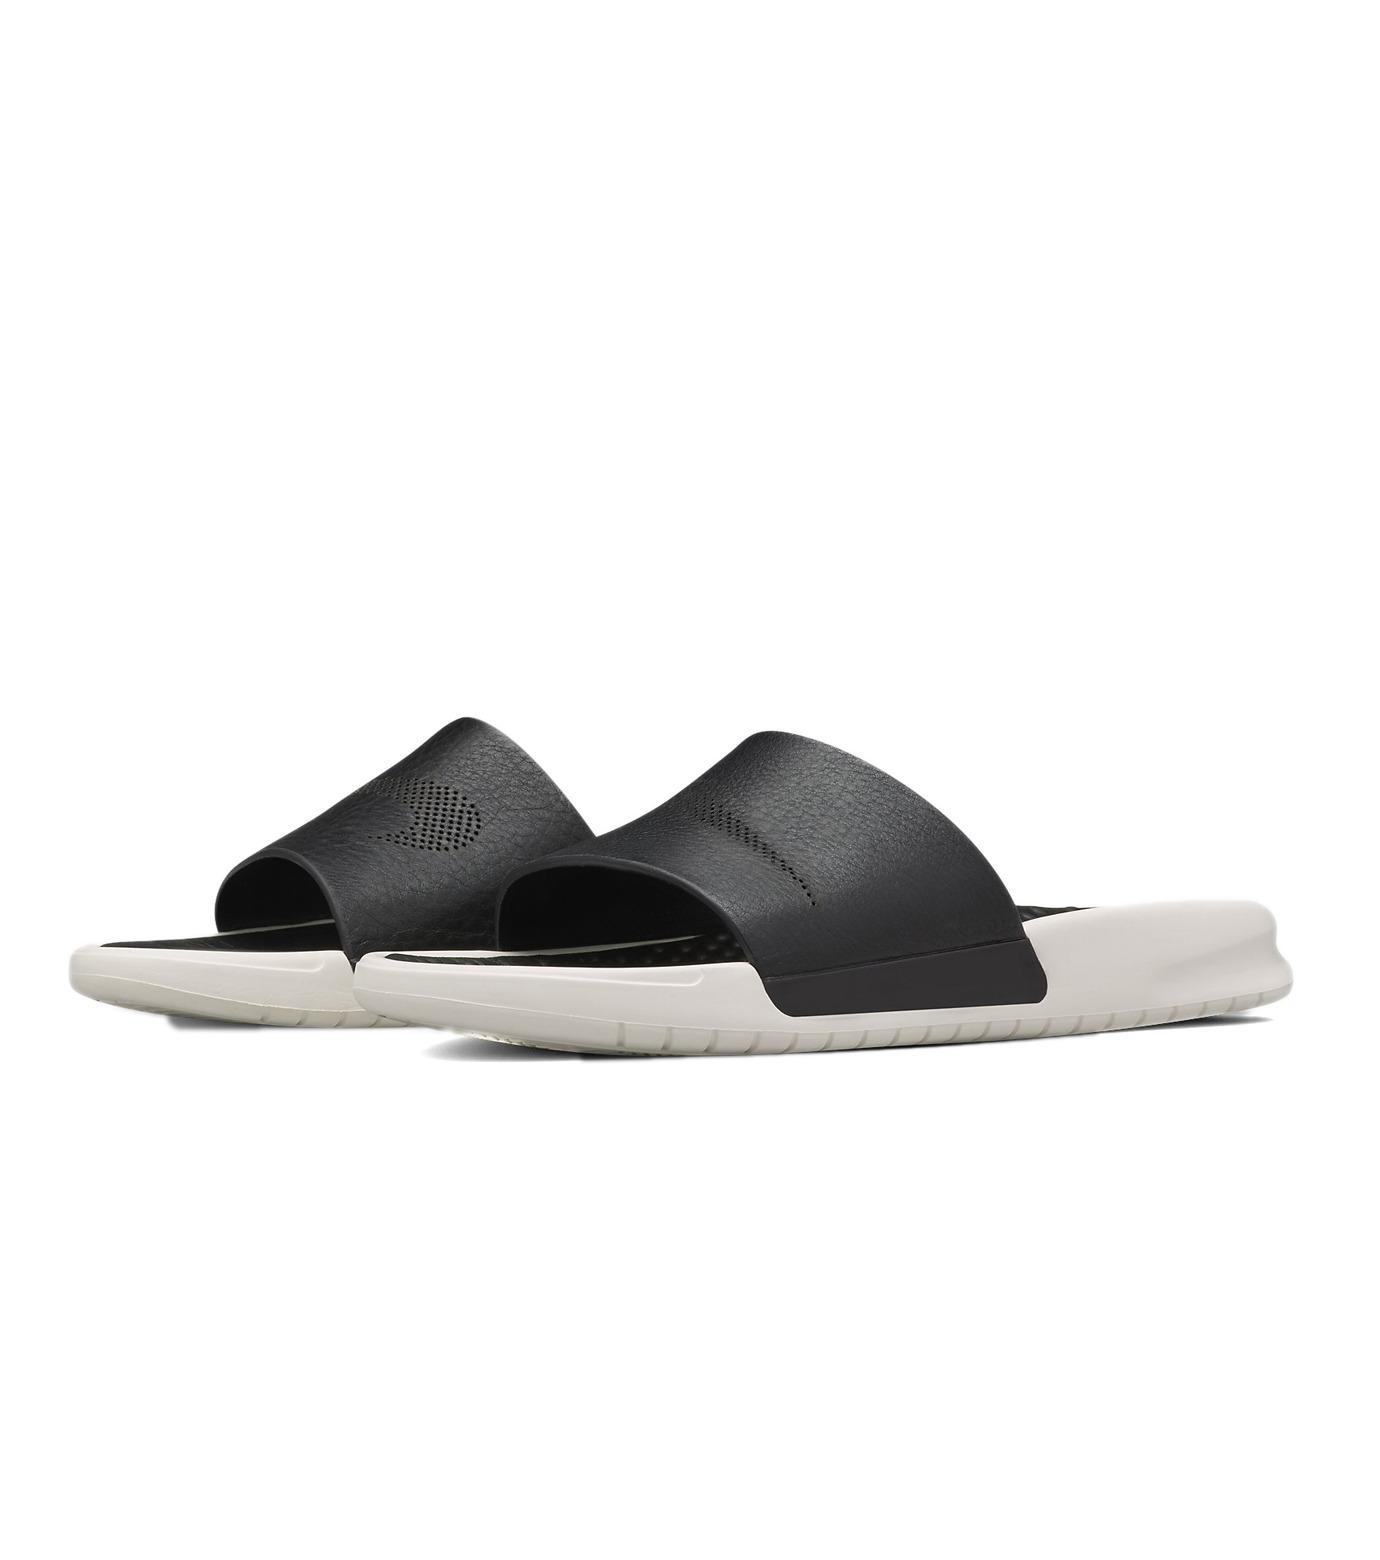 NIKE(ナイキ)のBenassi Slide Lux-BLACK(シューズ/shoes)-818742-001-13 拡大詳細画像3